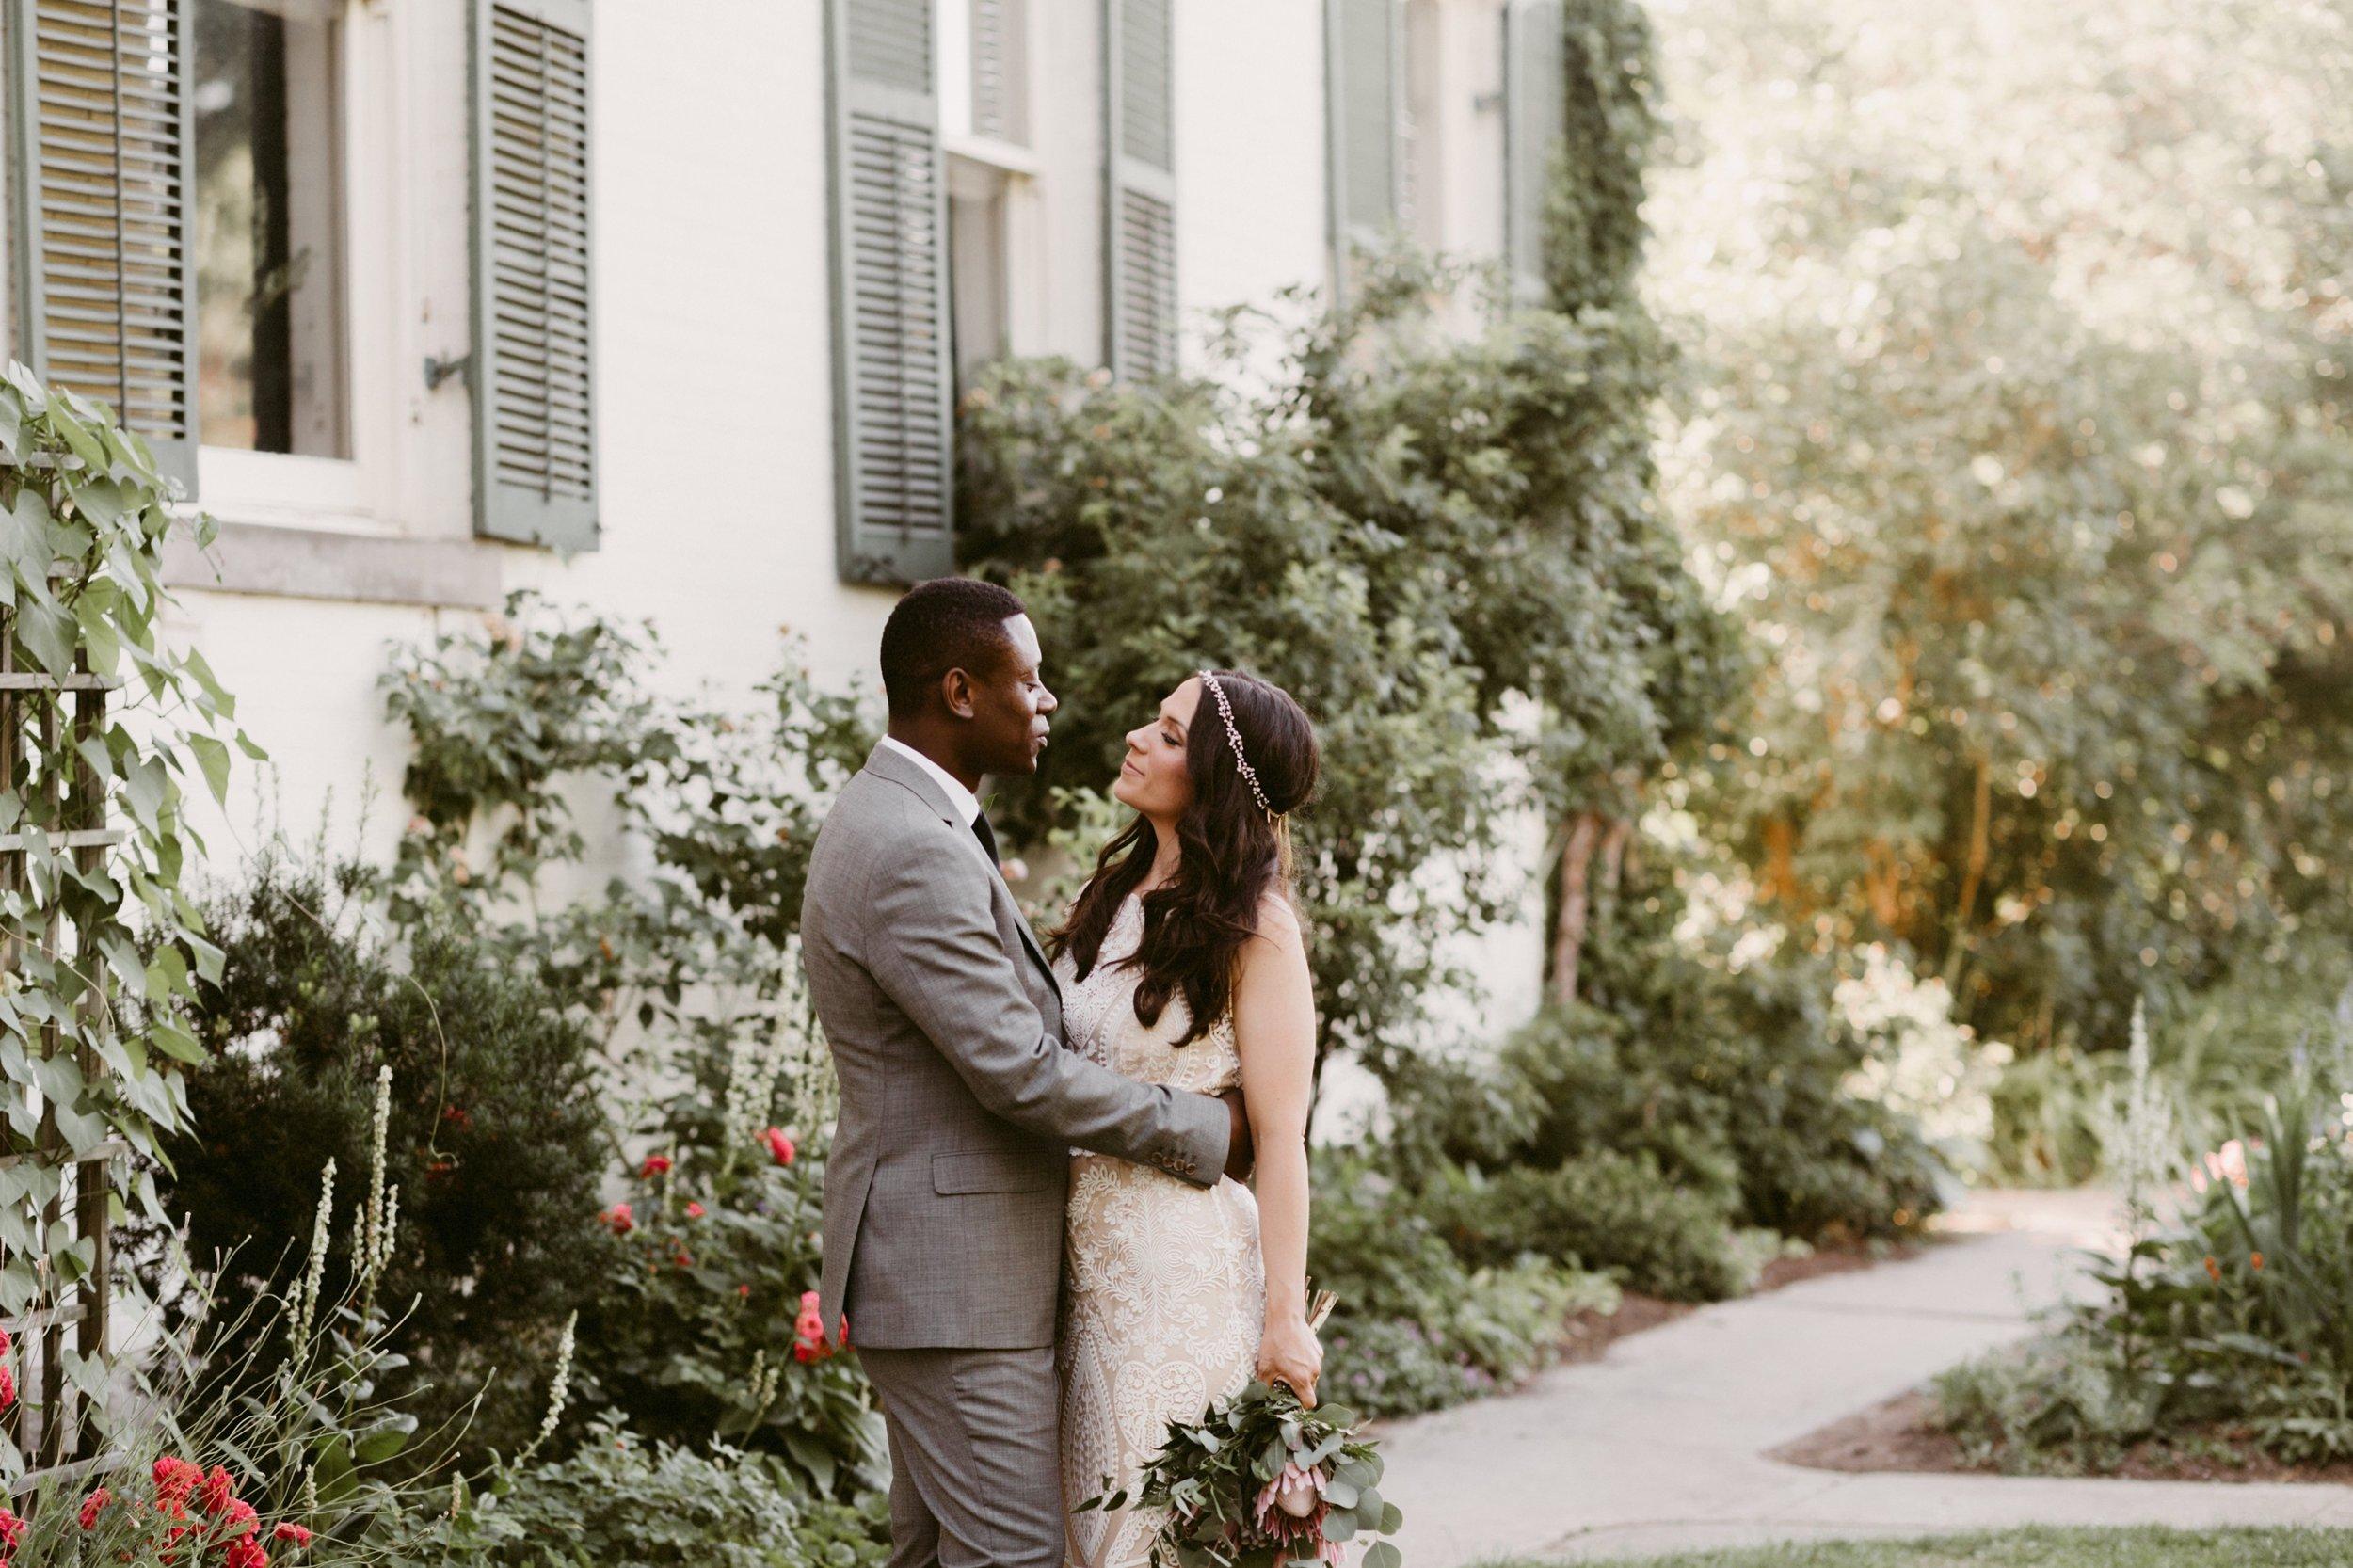 045_Spadina House Wedding (312 of 748)_House_Spadina_intimate_Toronto_Wedding.jpg